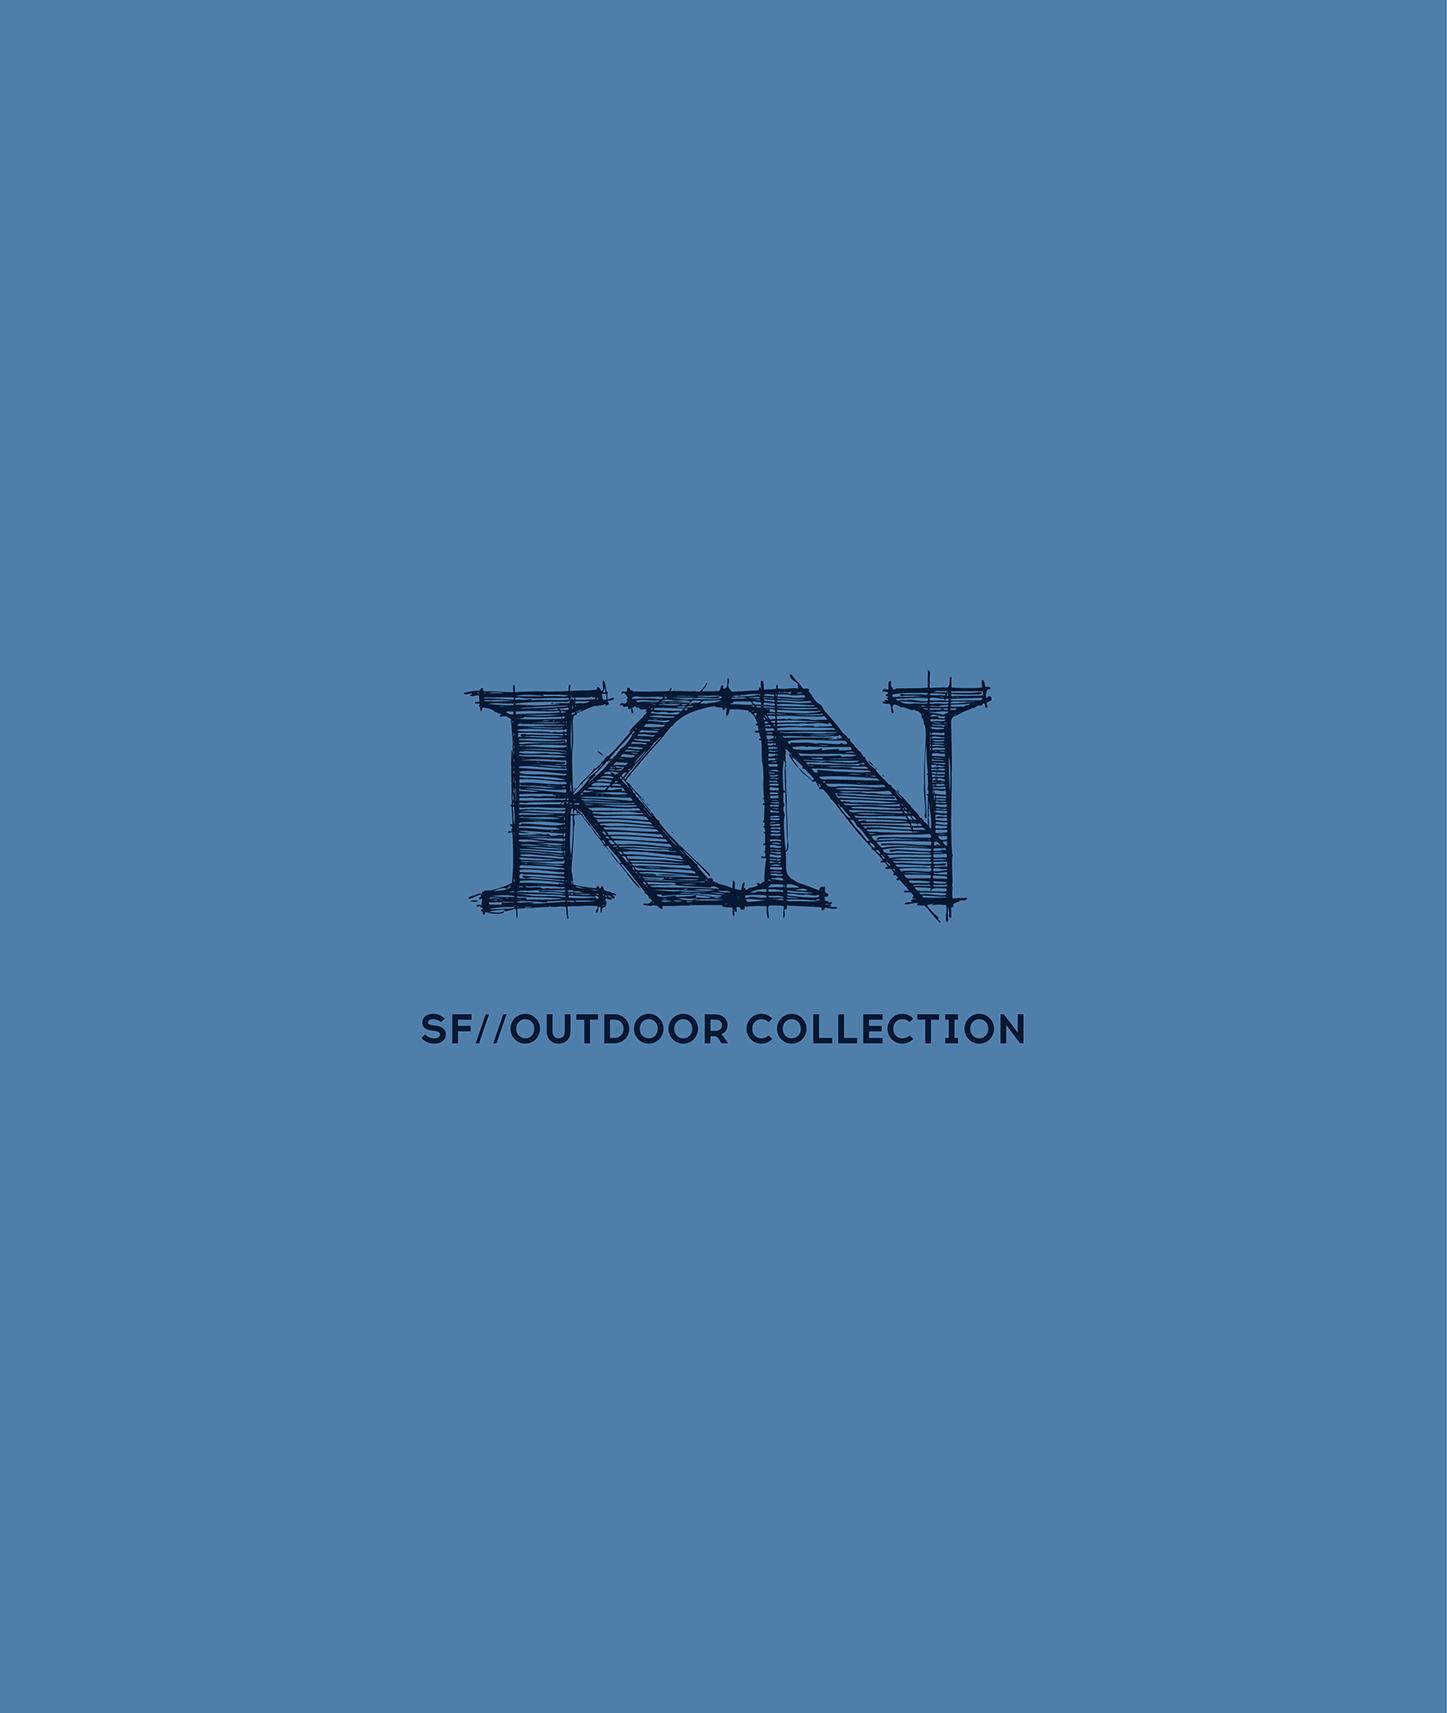 https://www.knindustrie.it/wp-content/uploads/2020/11/KN-SF_OUTDOOR_COLLECTION.jpg